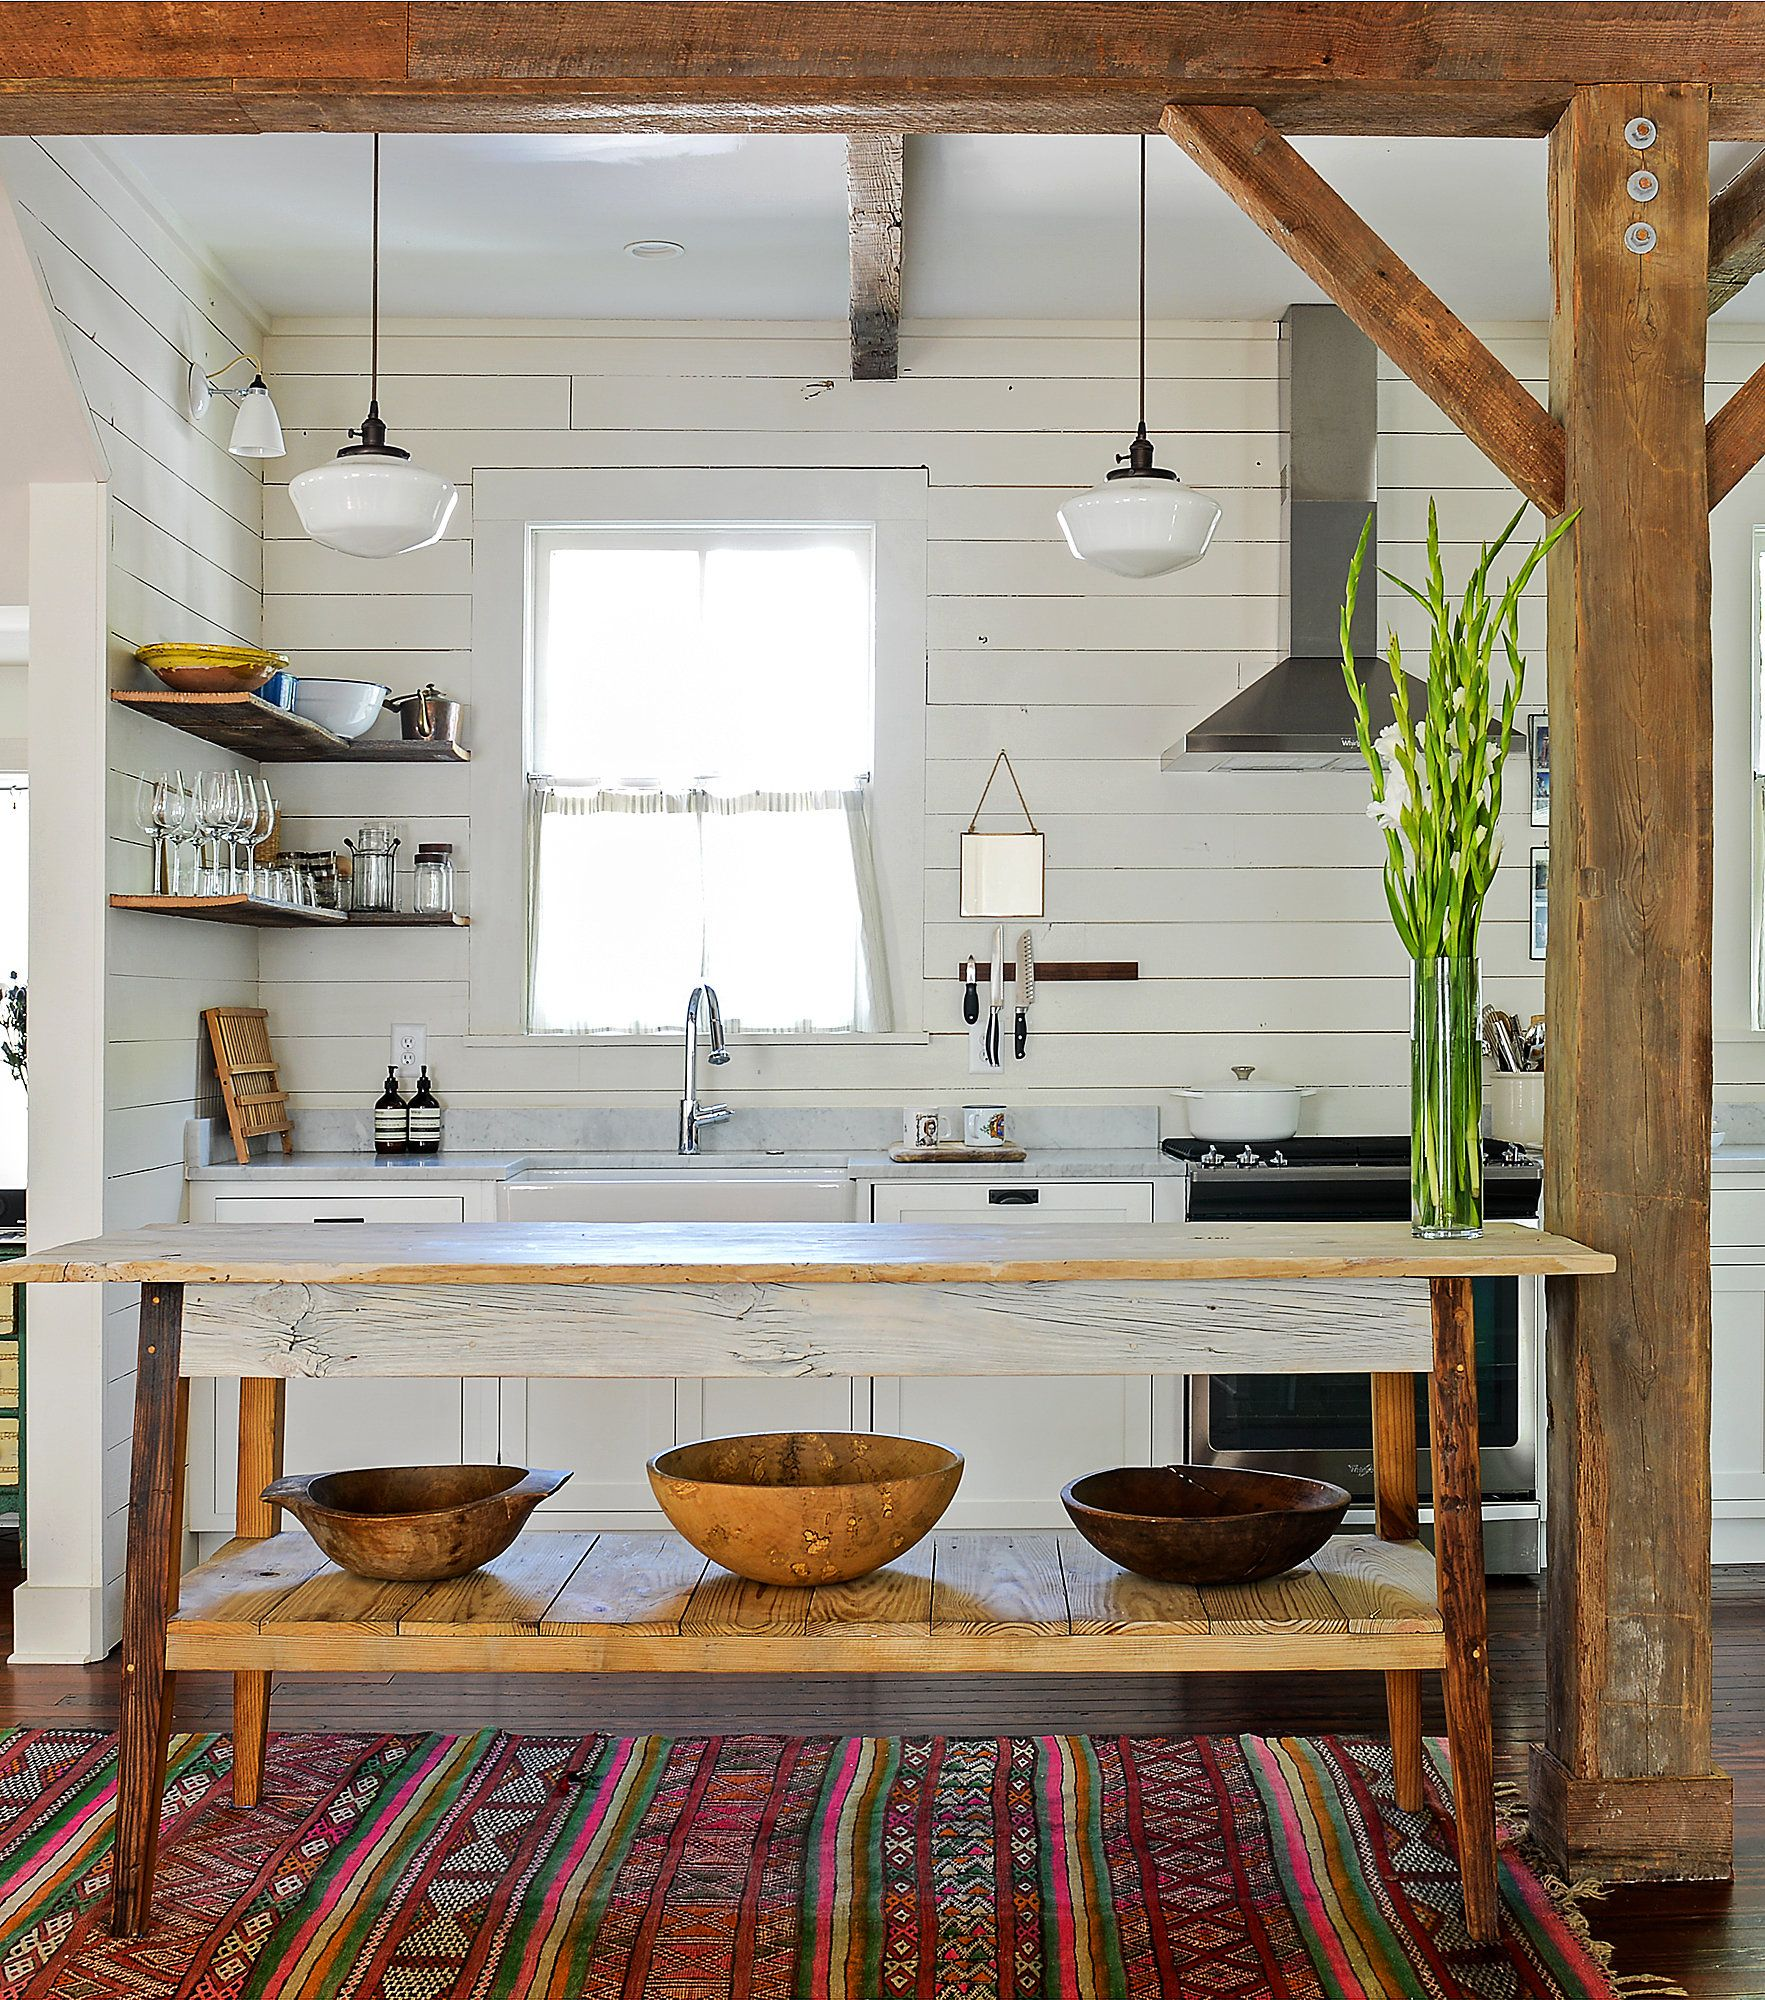 Find A Studio Apartment: Studio Apartment, Square Feet And Apartments